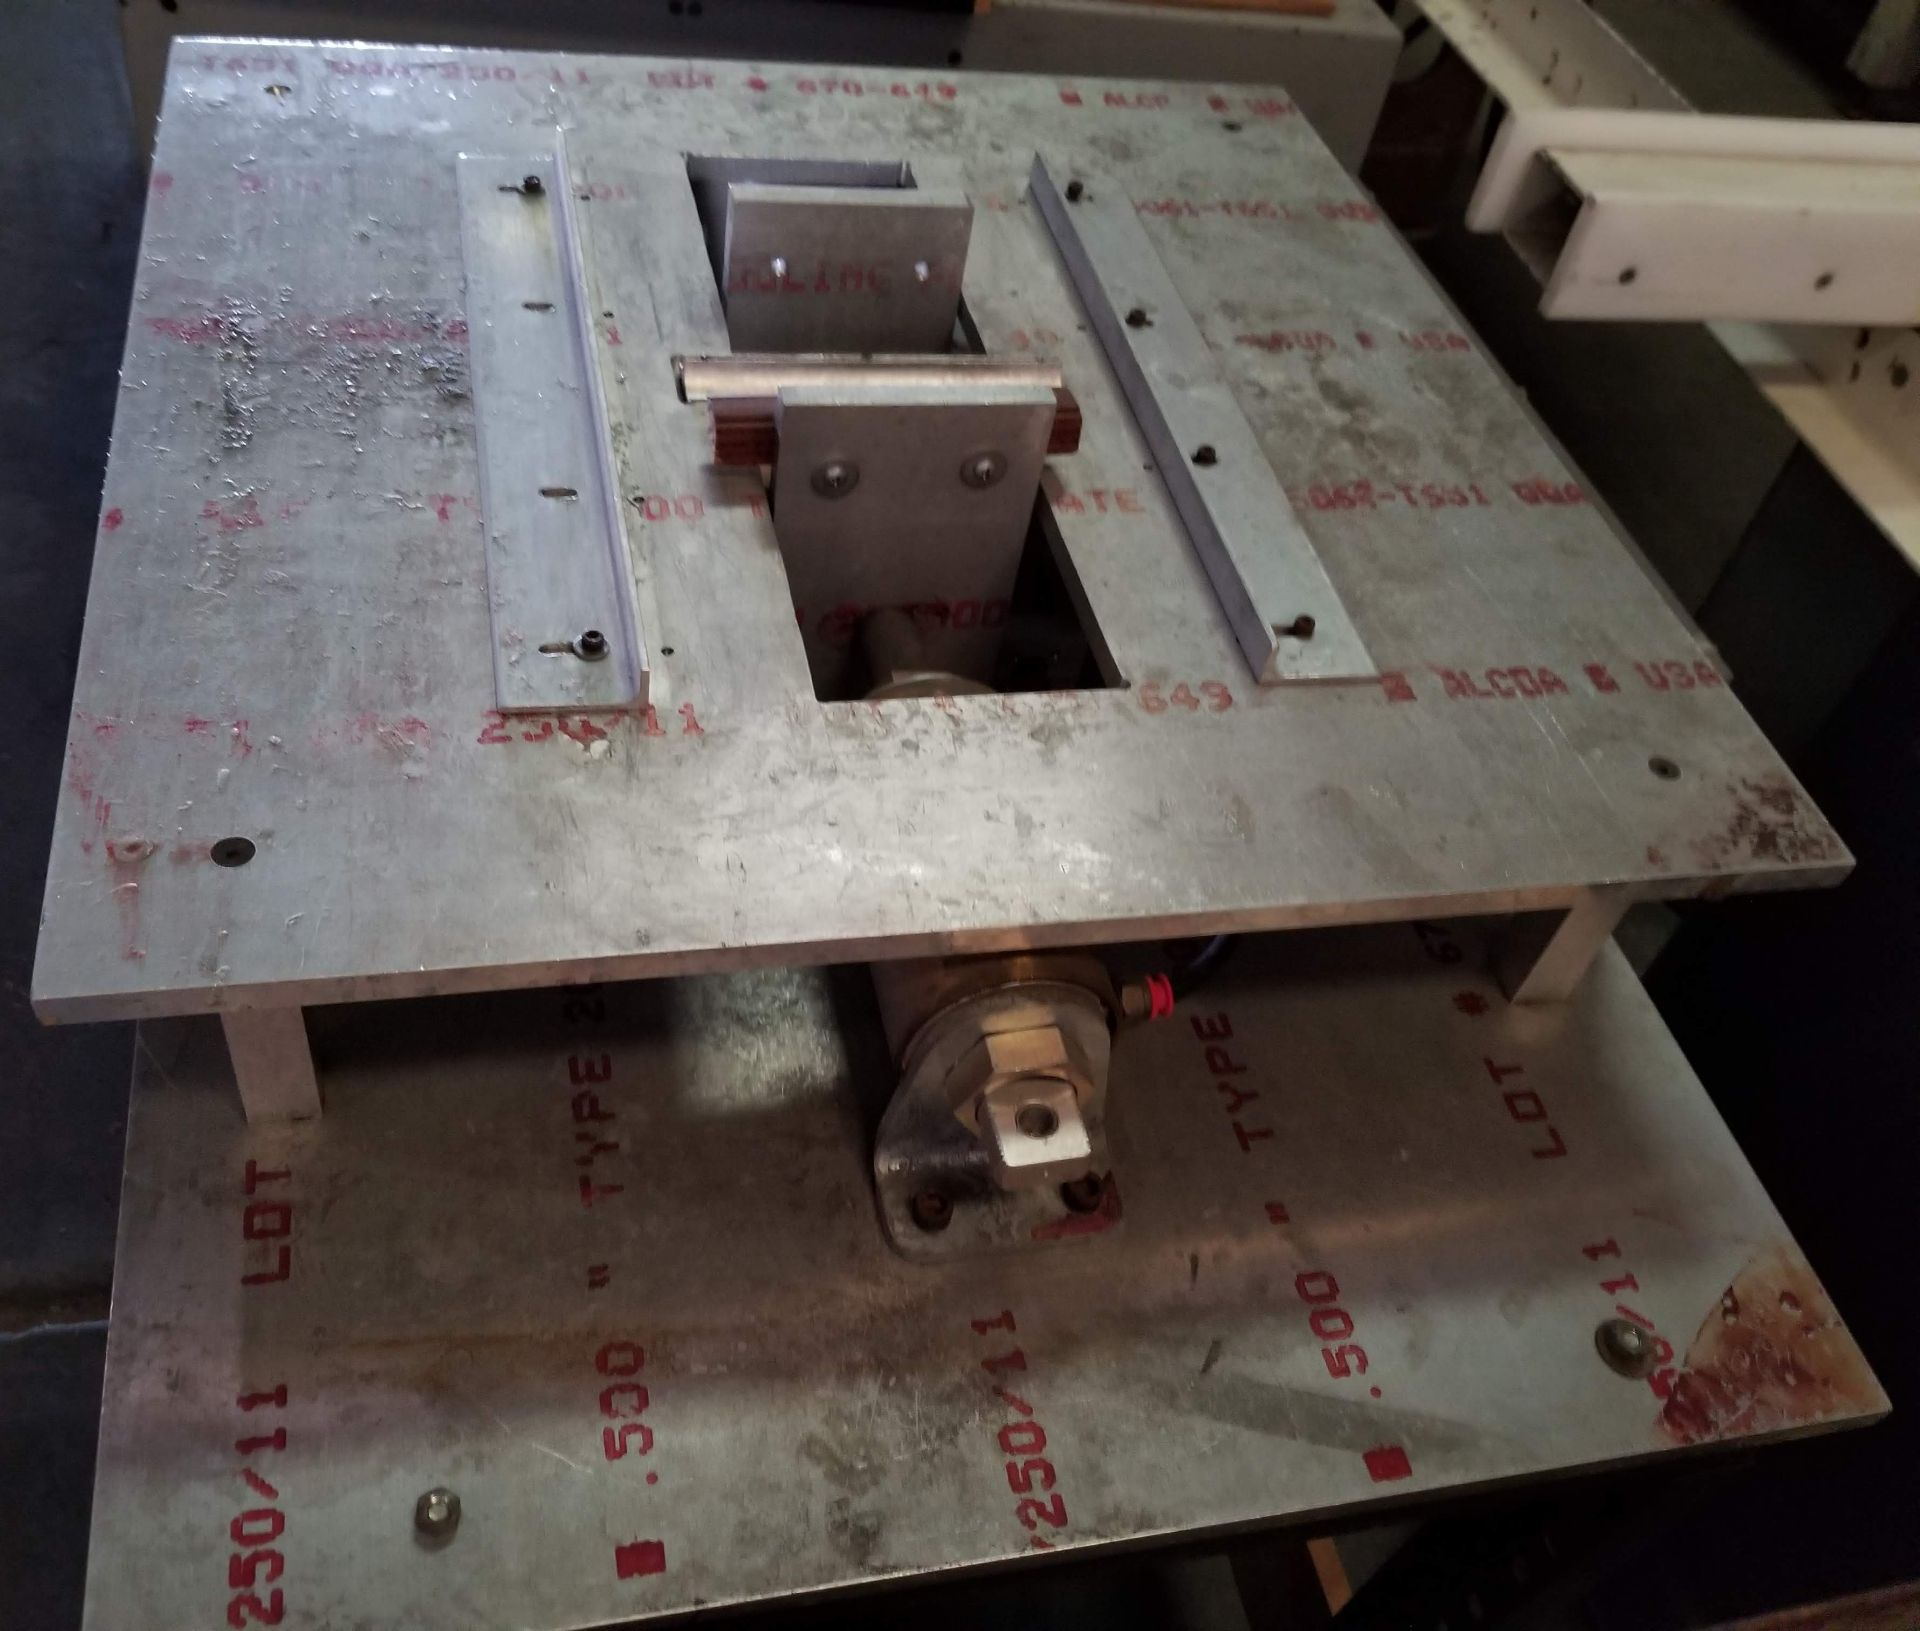 Pnuematic Press w/ Aluminum Table - Image 2 of 5